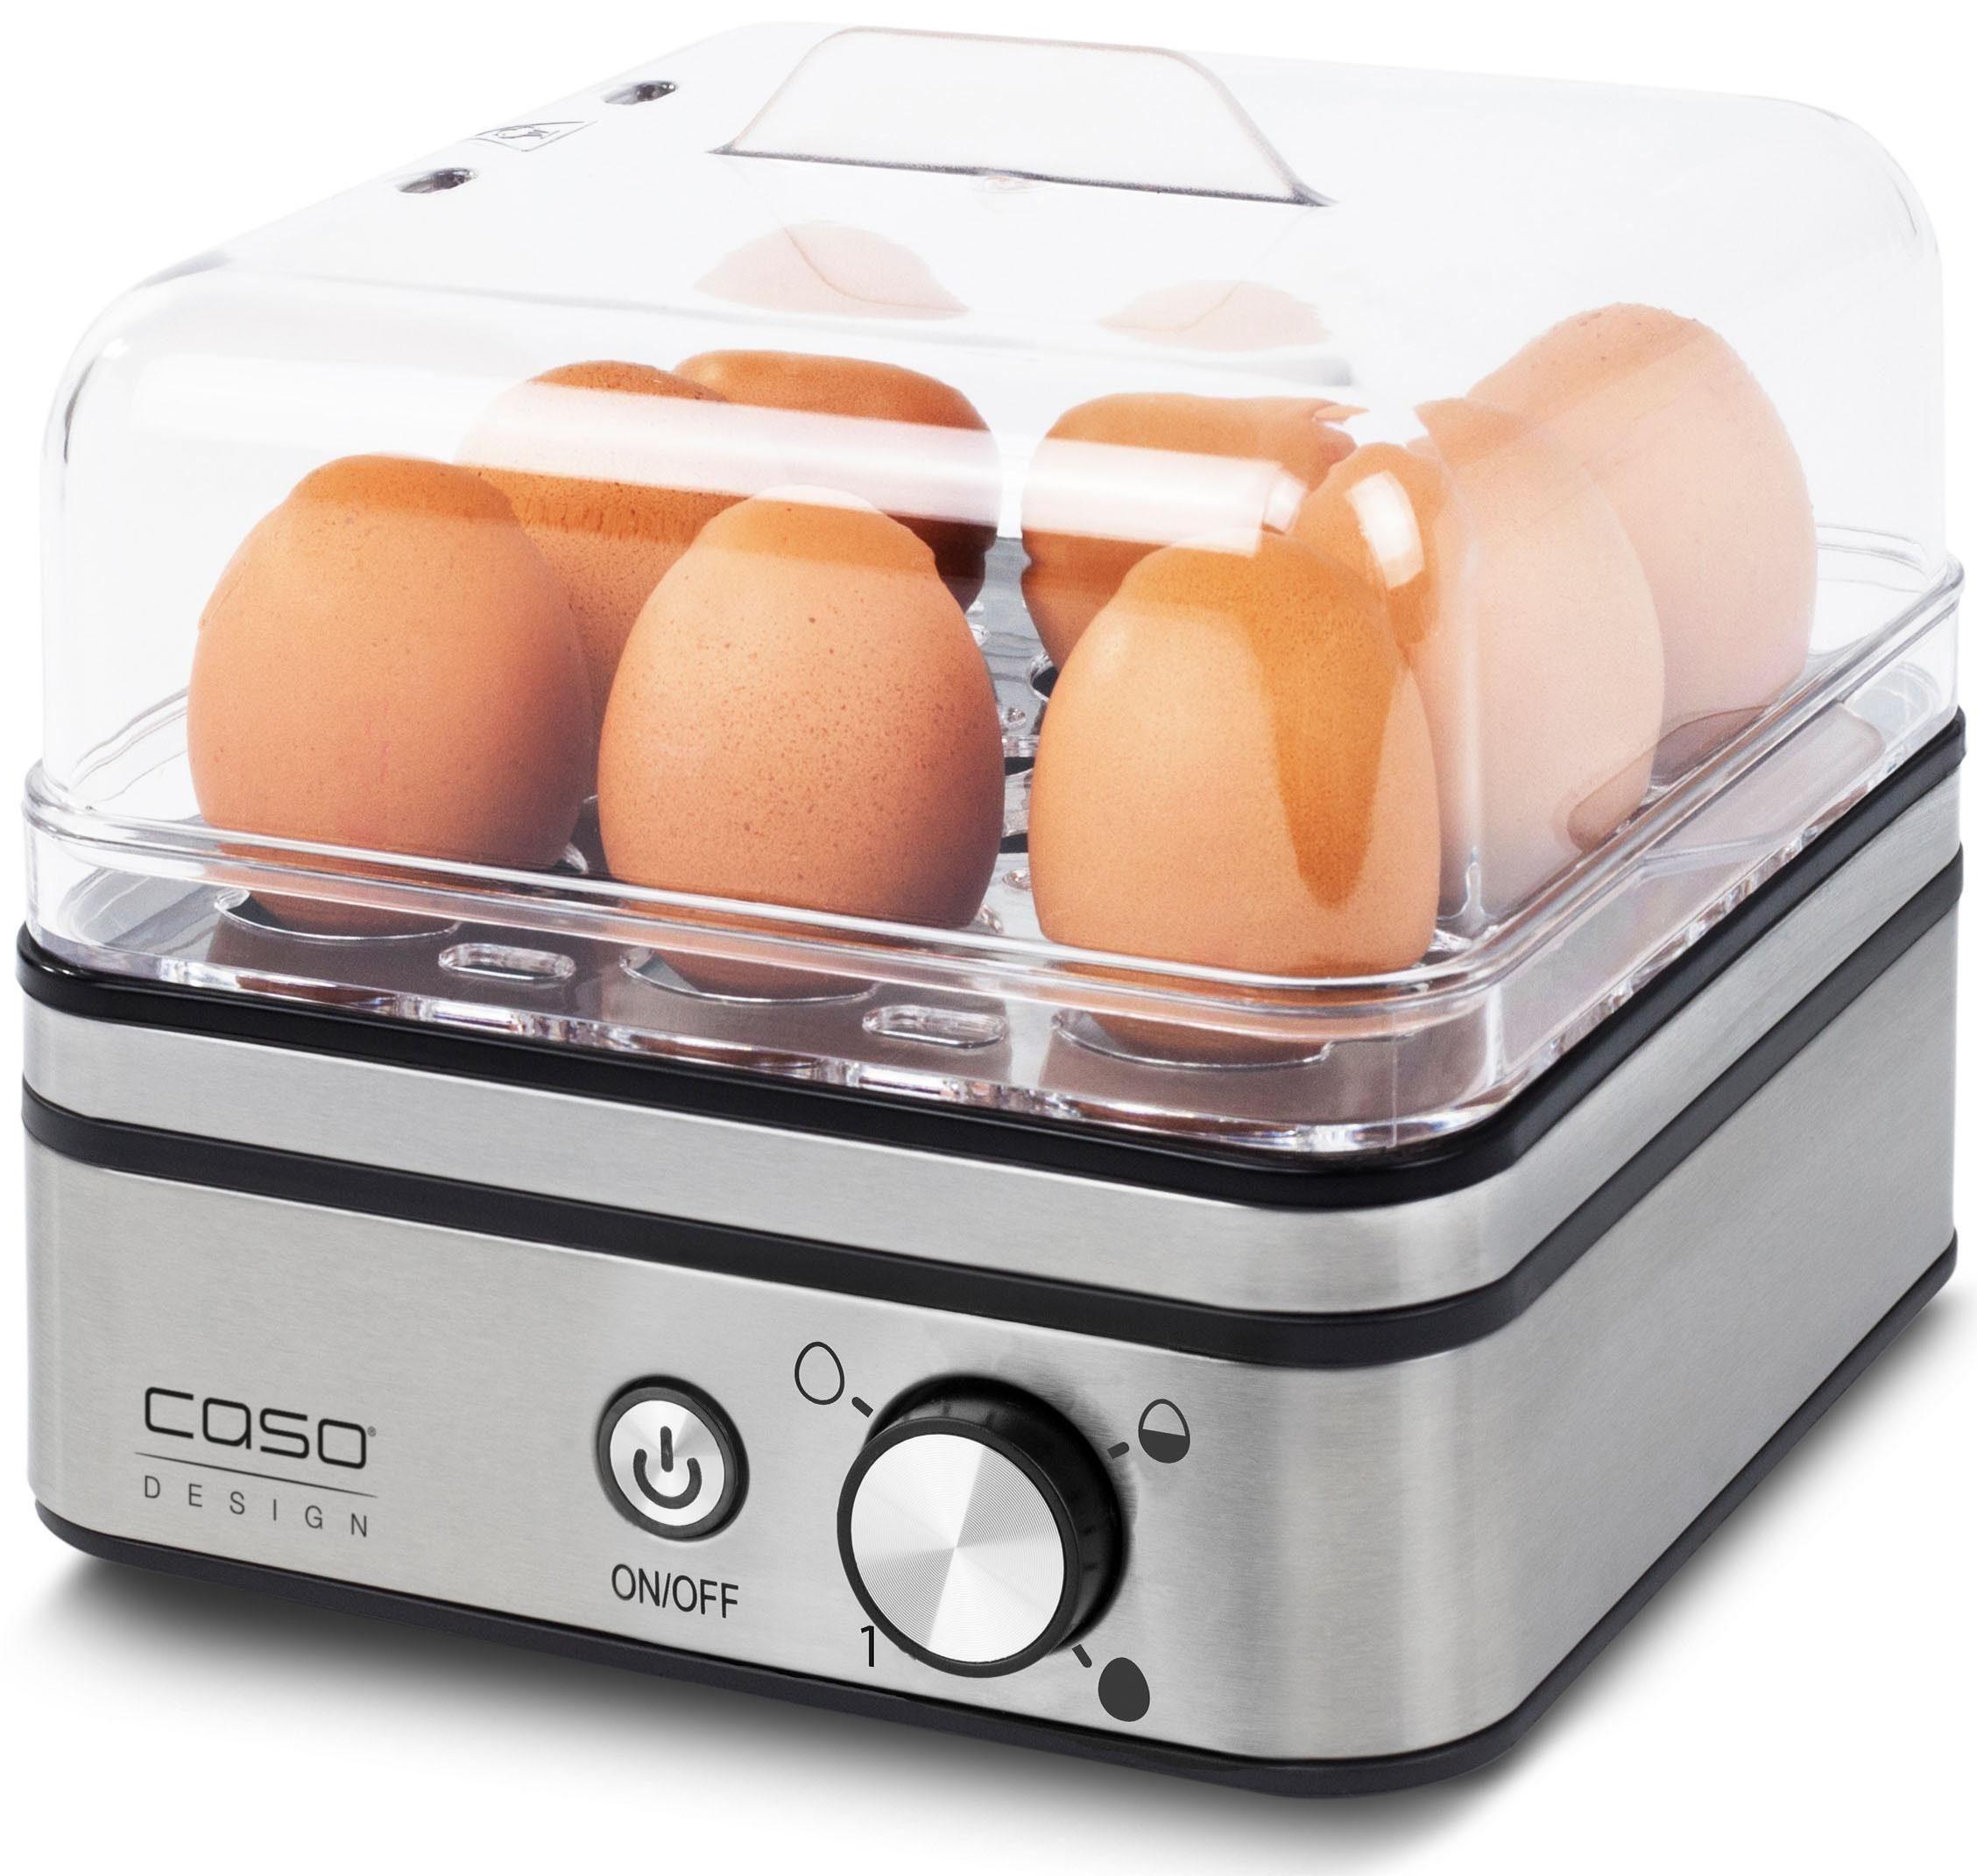 Caso Eierkocher E9, Anzahl Eier: 8 St., 400 W